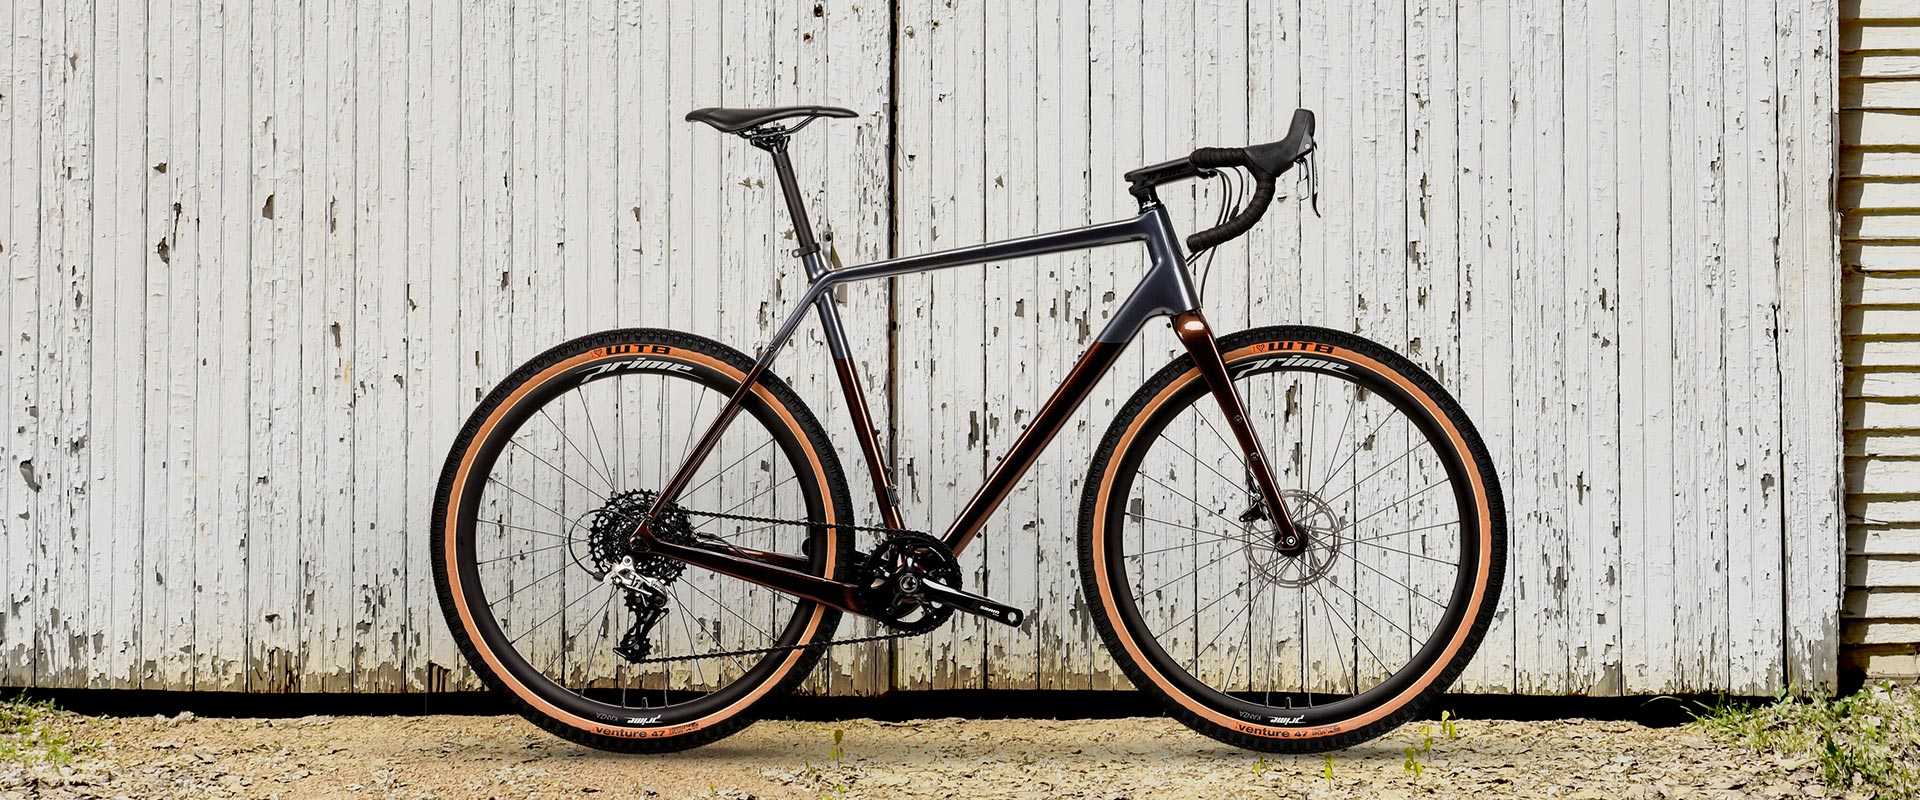 Substance CRX Adventure Road Bike